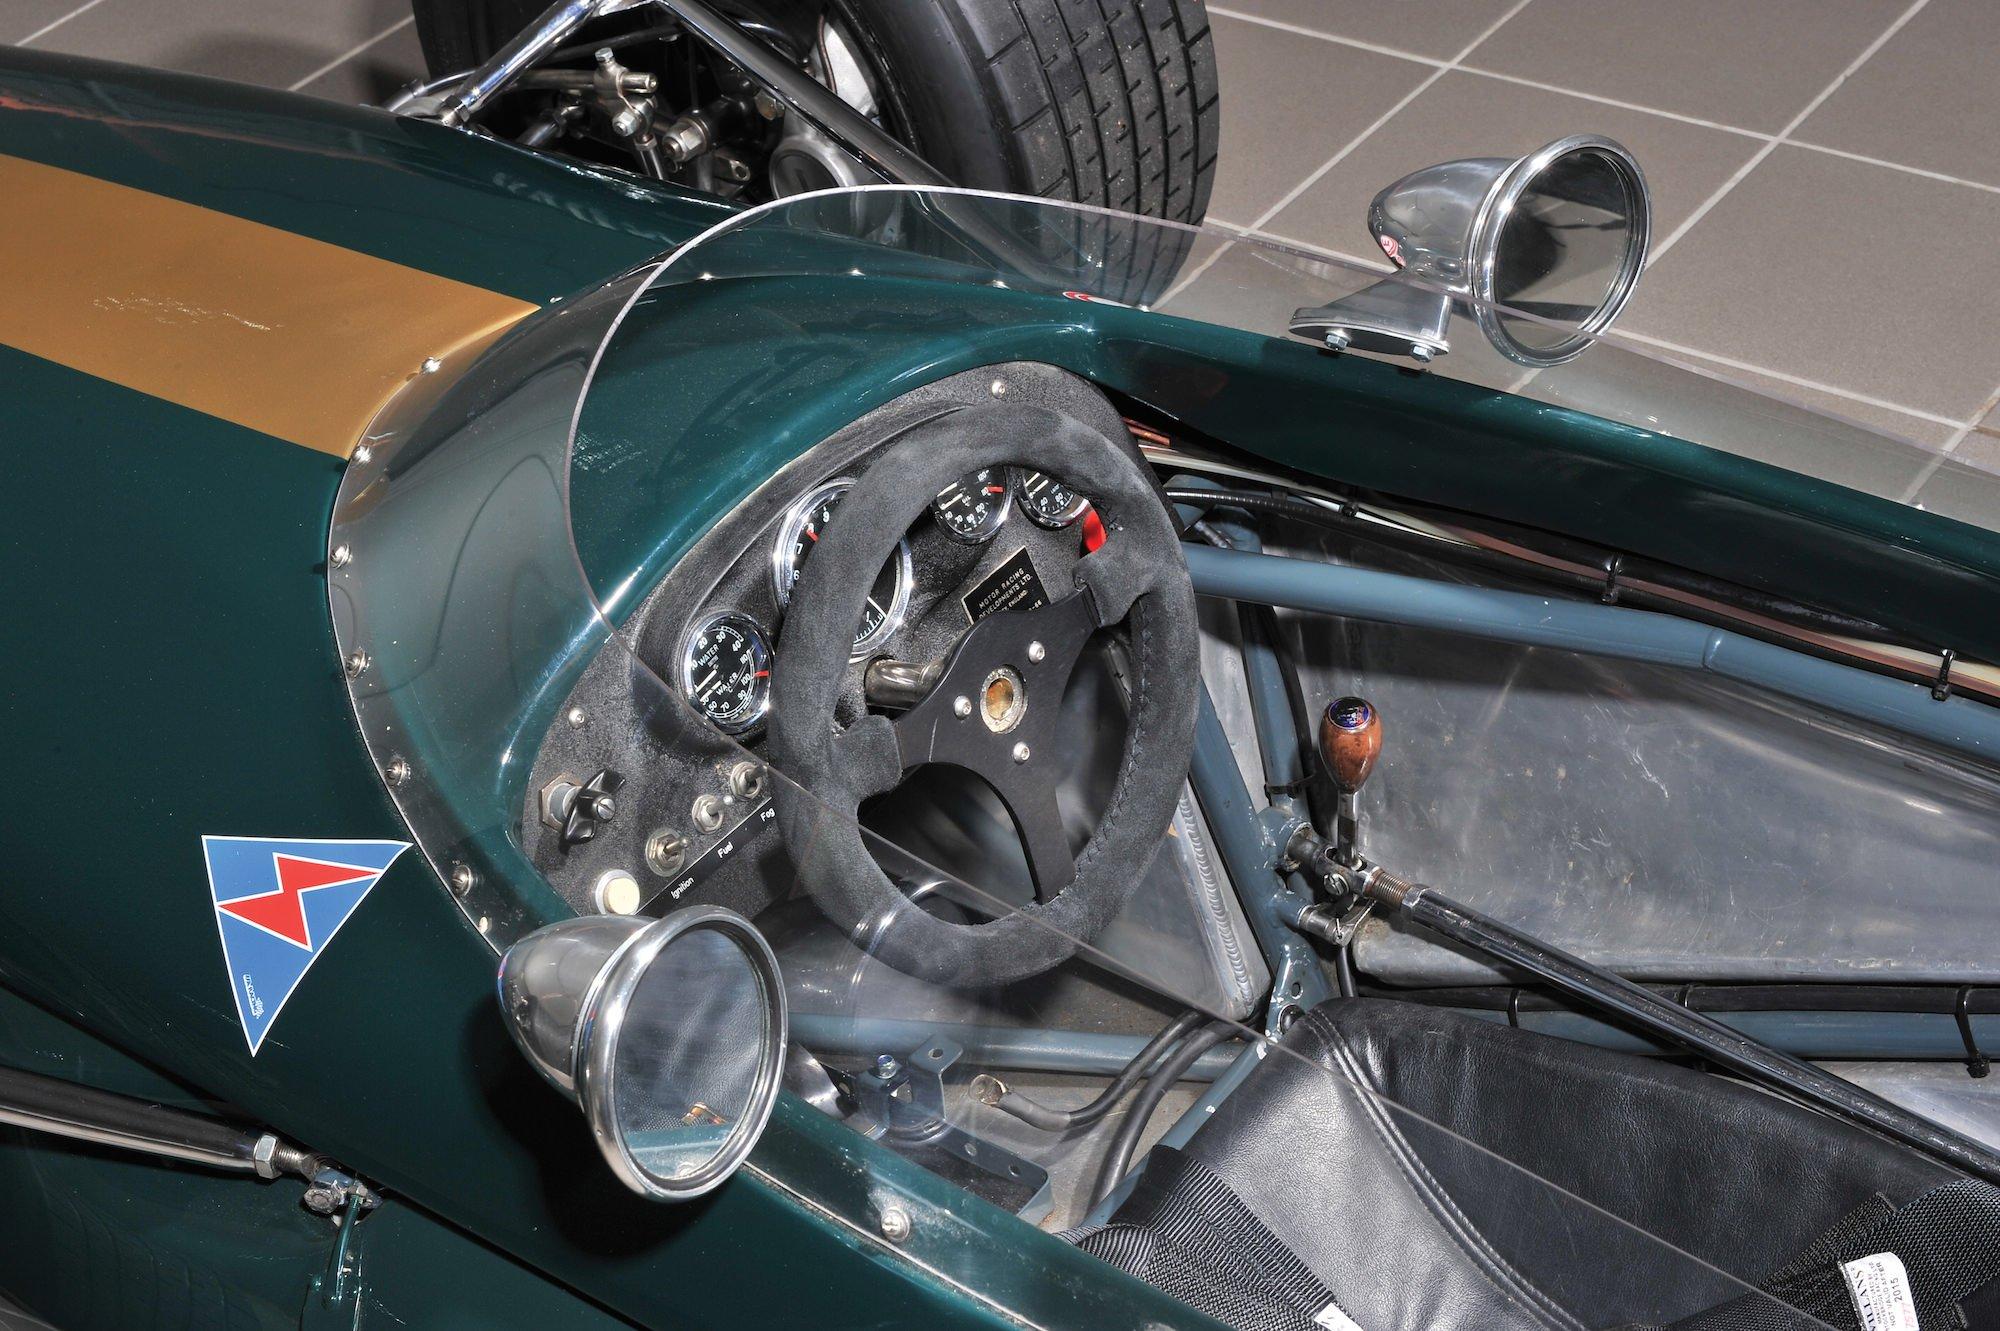 Classic F1 Car for sale 1966 Brabham BT20 Retro Race Cars